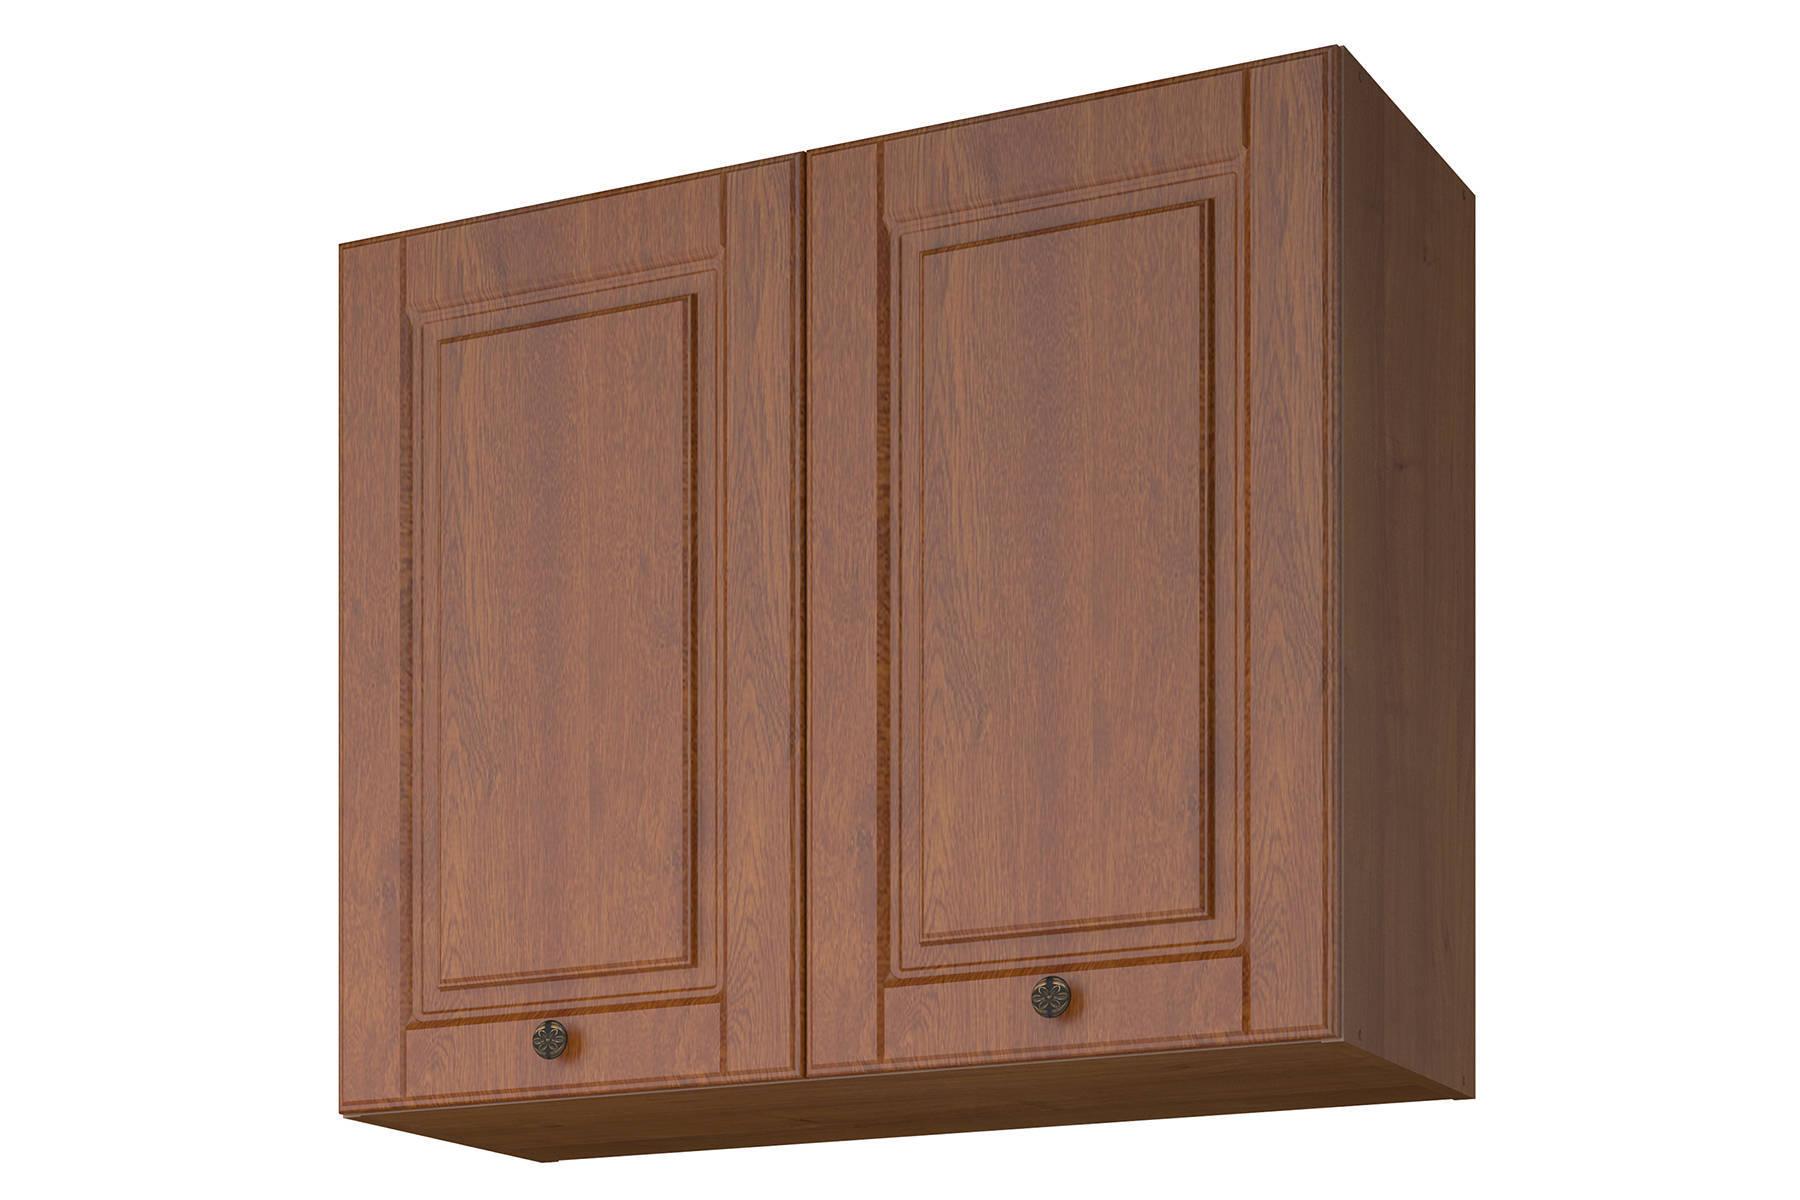 Шкаф навесной Lima СТЛ.308.03 шкаф навесной для вытяжки lima стл 308 04